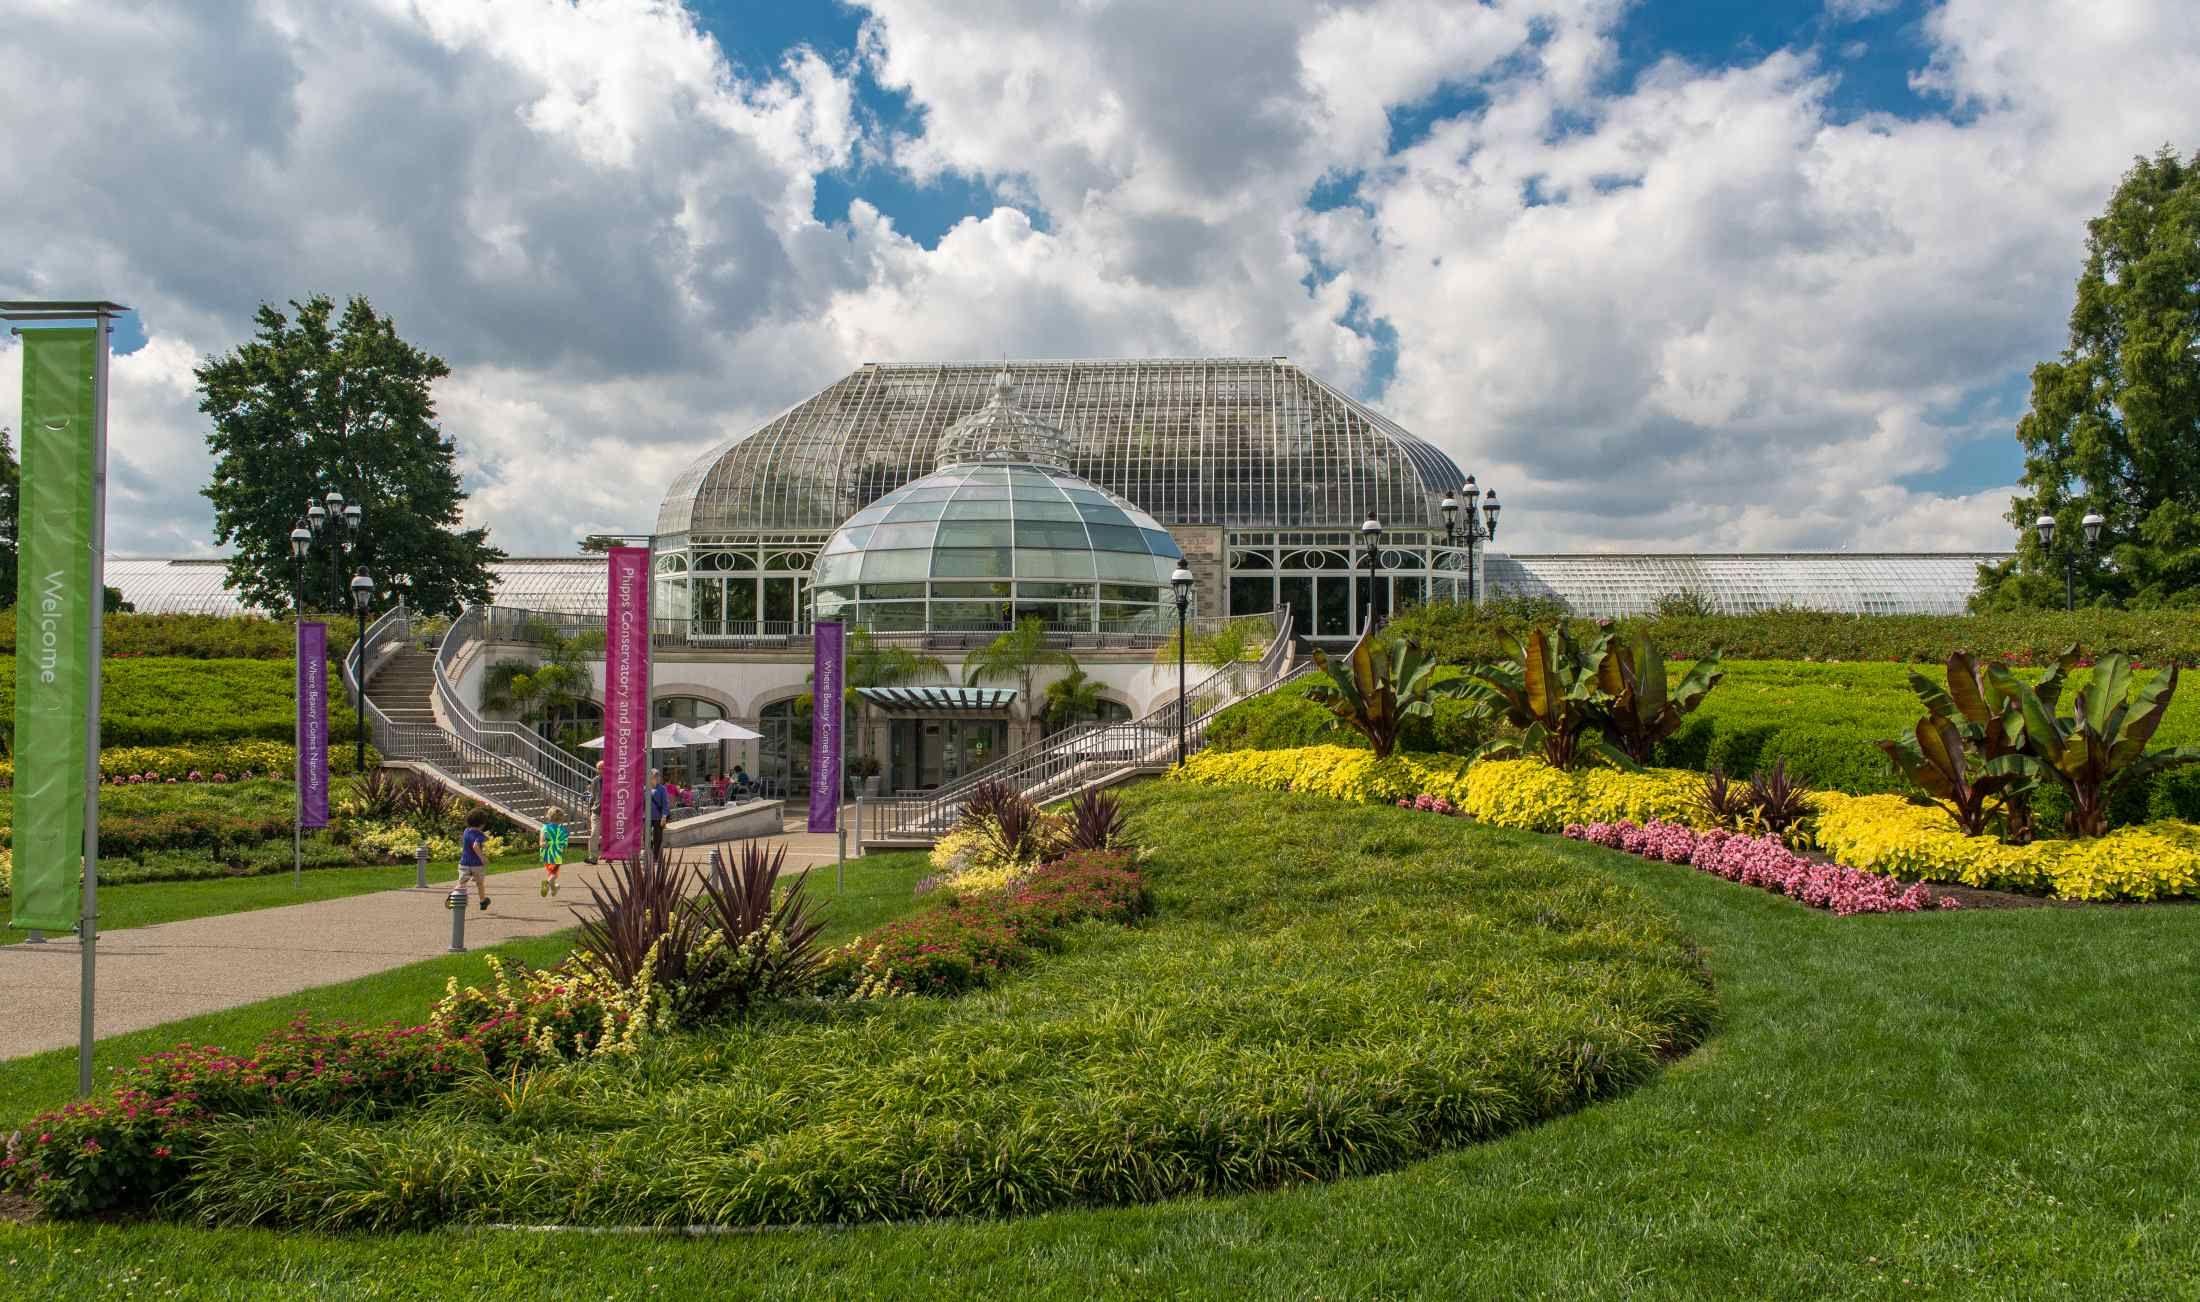 0e6edfc2bde3520fd1503923b6ed5fba - Phipps Conservatory And Botanical Gardens Parking